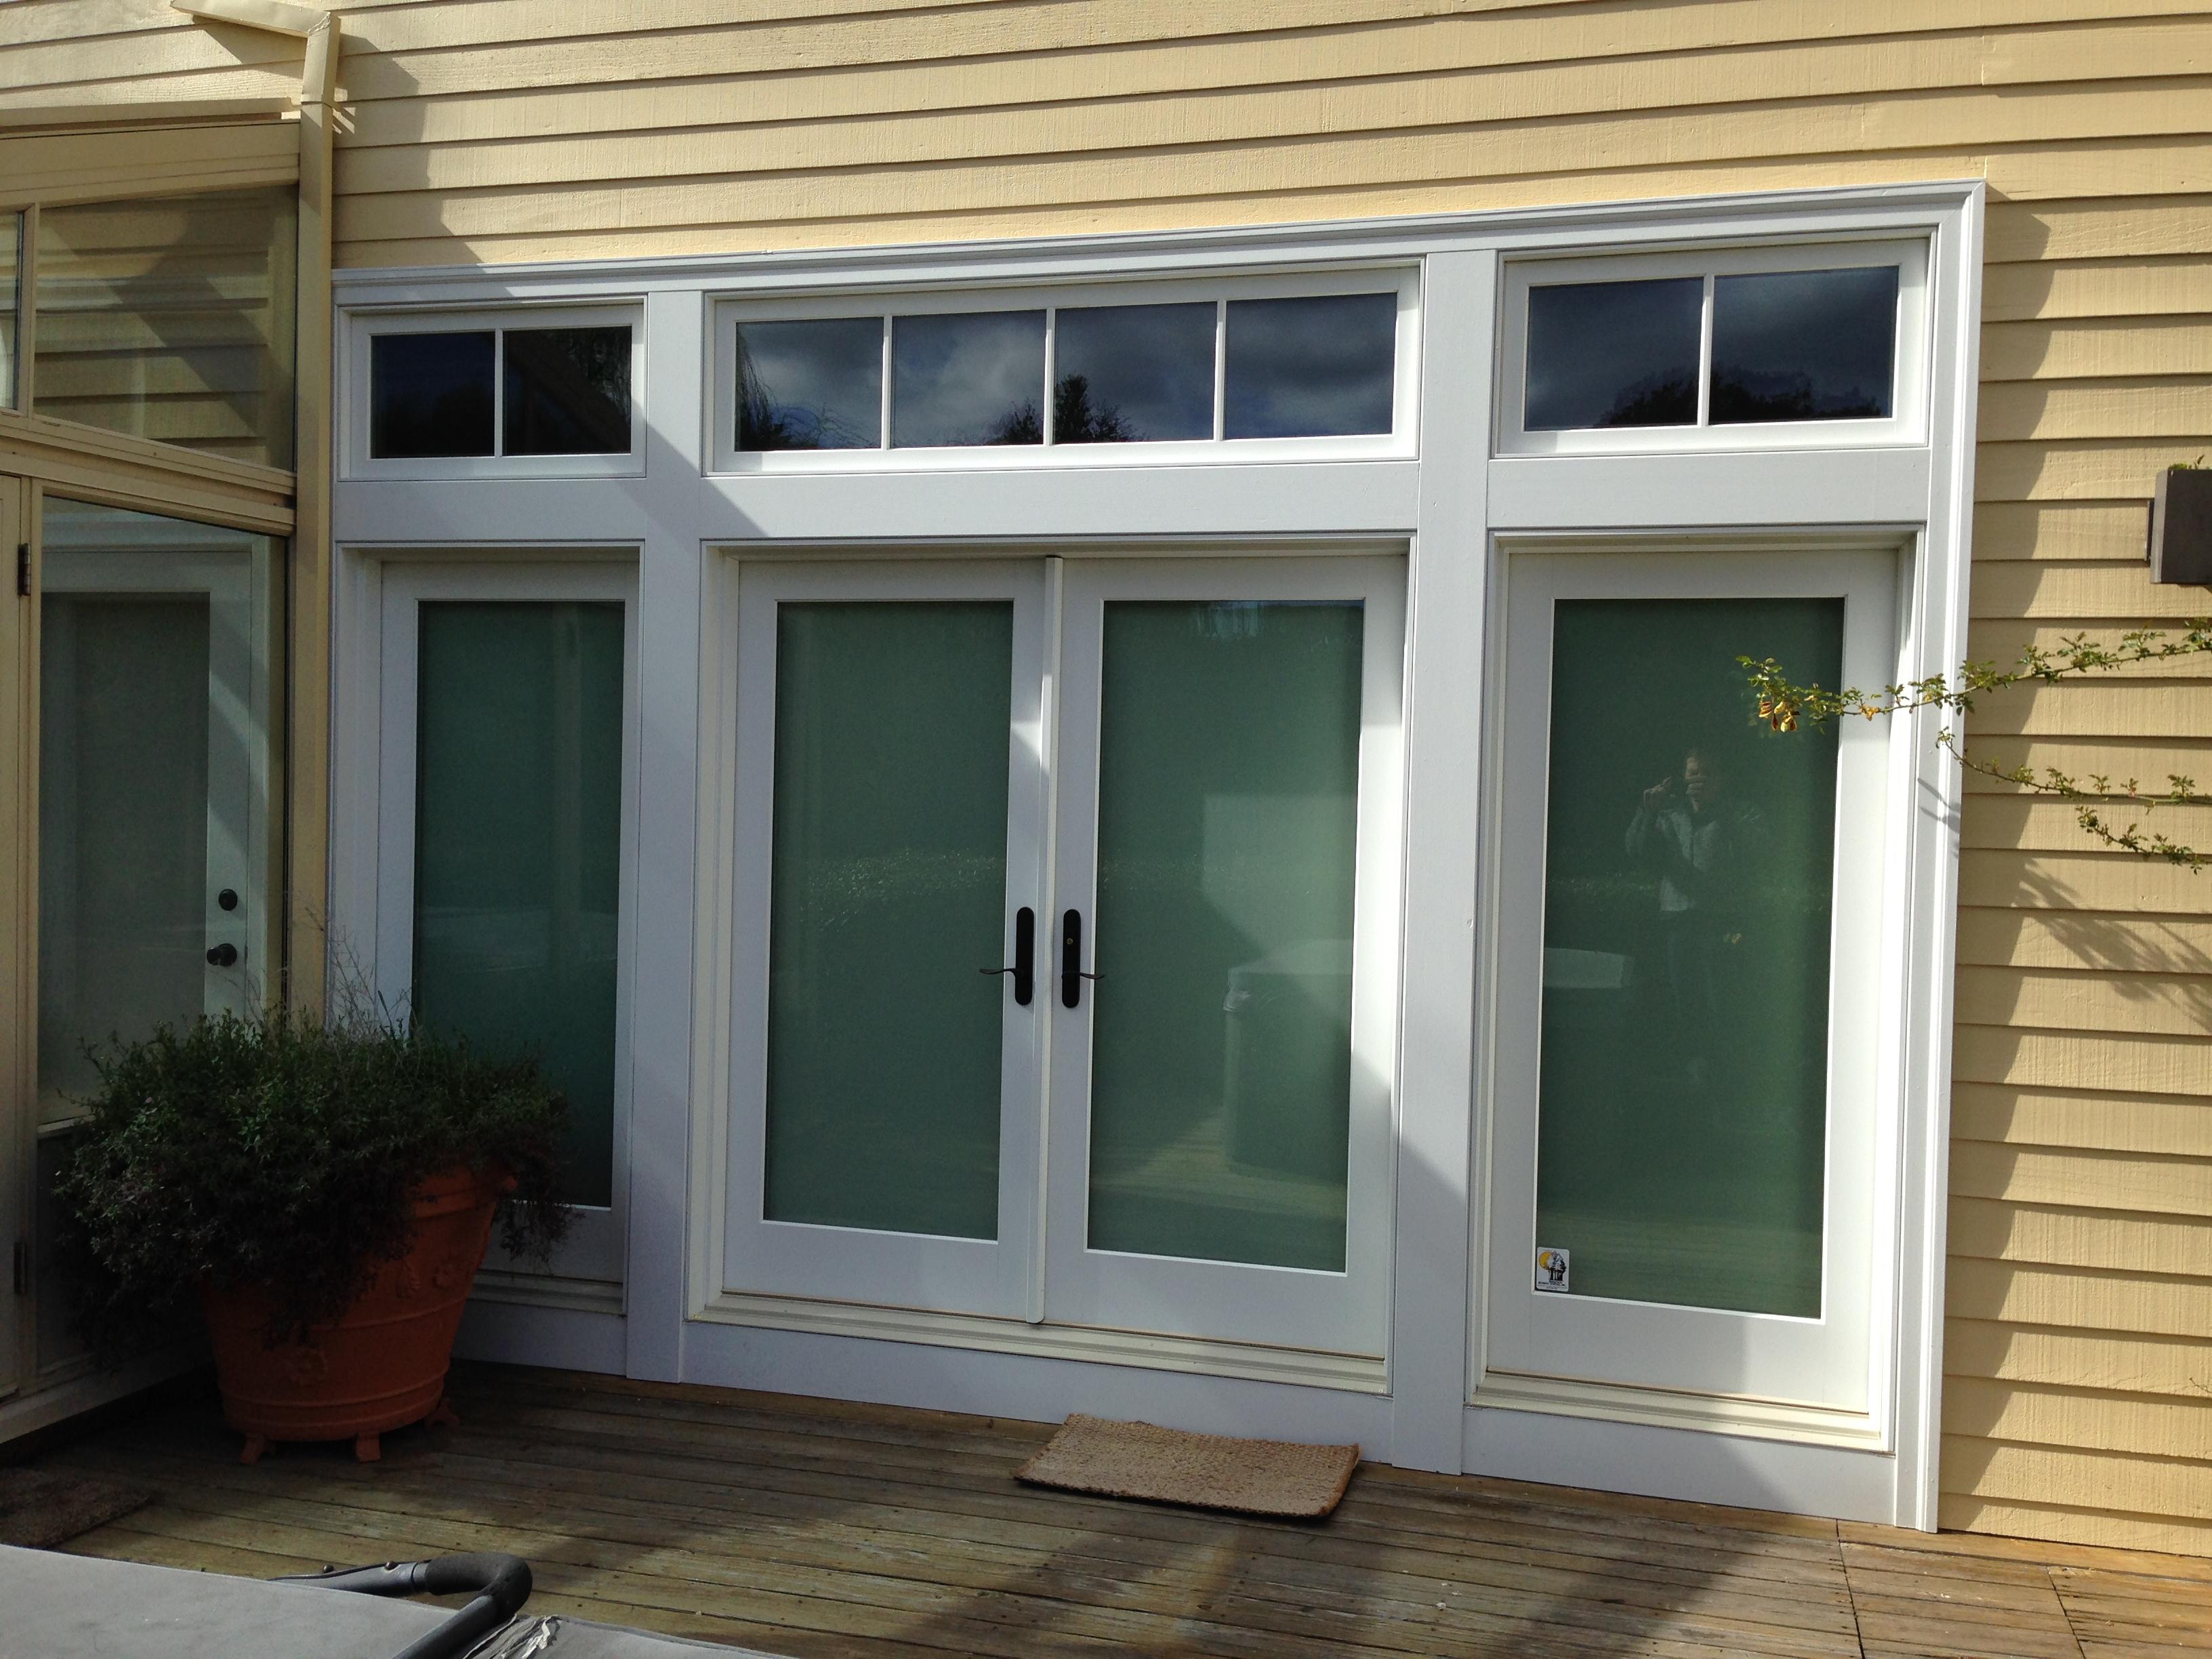 2448 #8F763C Marvin Clad Inswing Door Marin Glass And Windows Blog save image Clad Doors 47573264